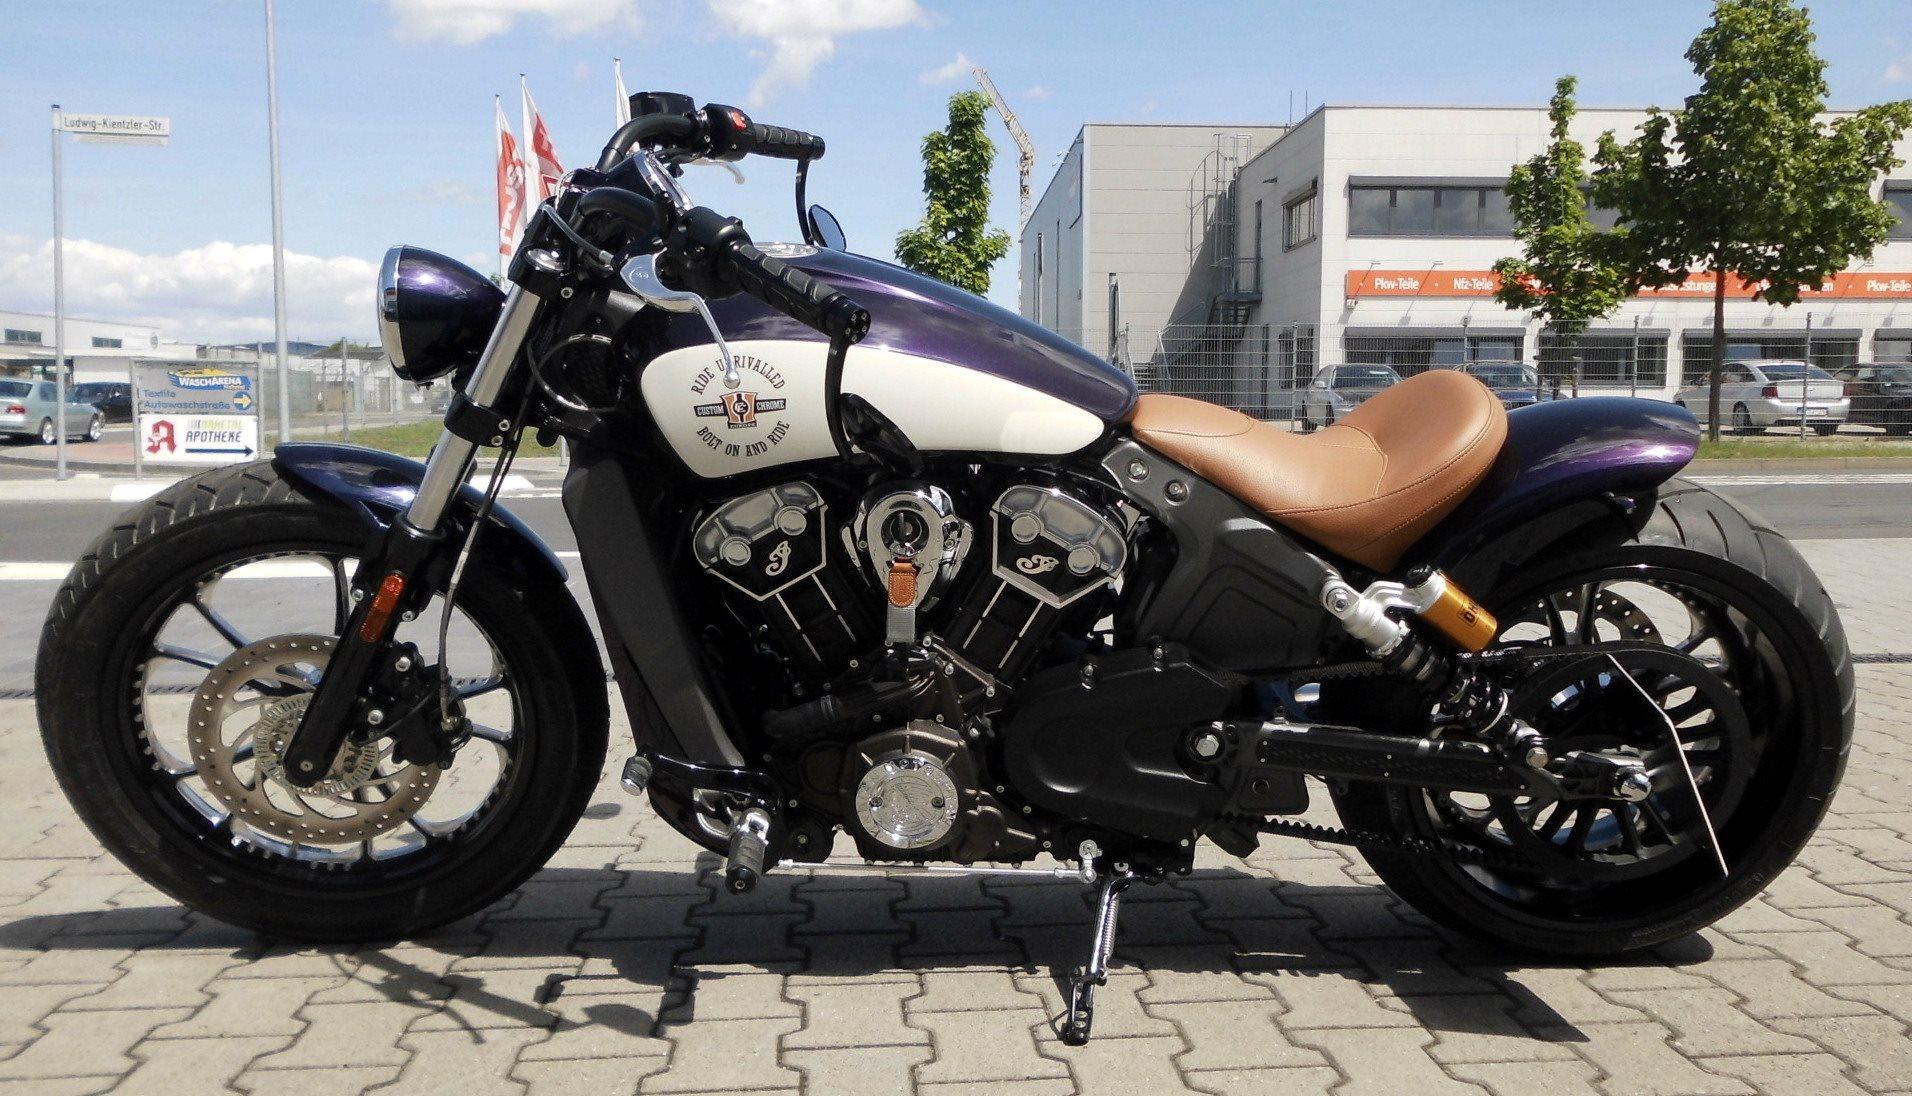 umbauten motorrad sk bikes stefan kuempel 55543 bad kreuznach schwabenheimerweg 54. Black Bedroom Furniture Sets. Home Design Ideas